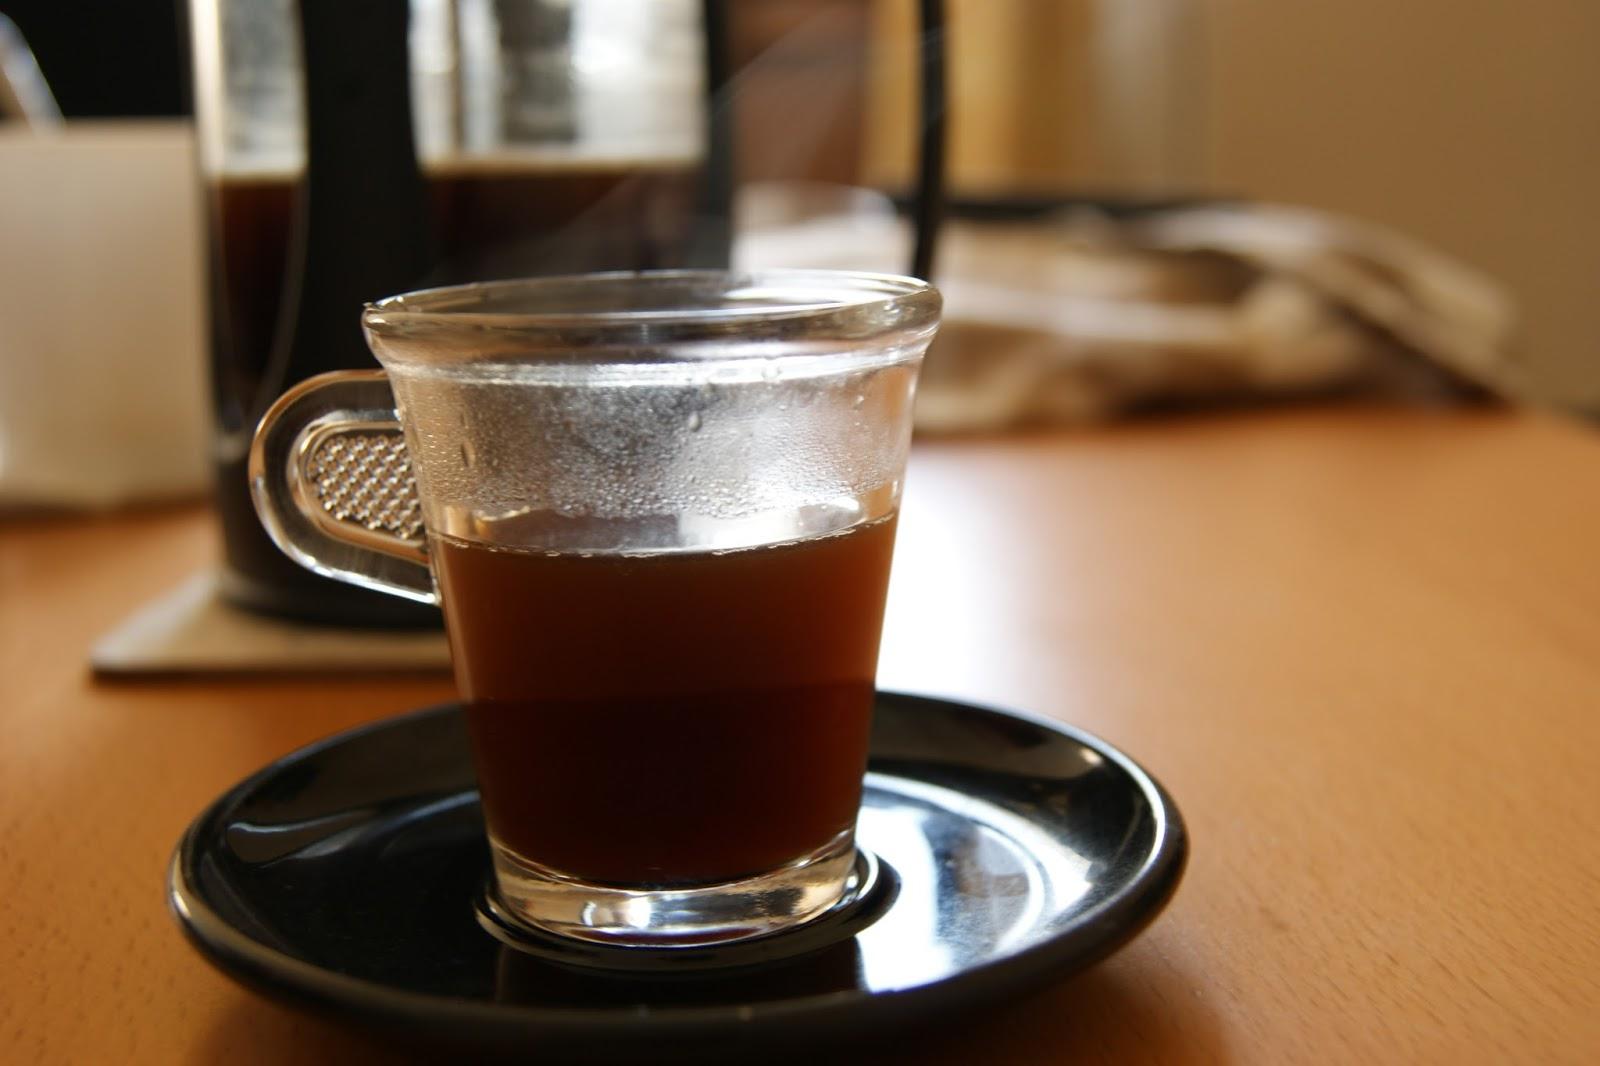 artikel kopi, jenis jenis minuman kopi, jenis kopi terbaik, kafe kopi, kopi indonesia, kopi terbaik,